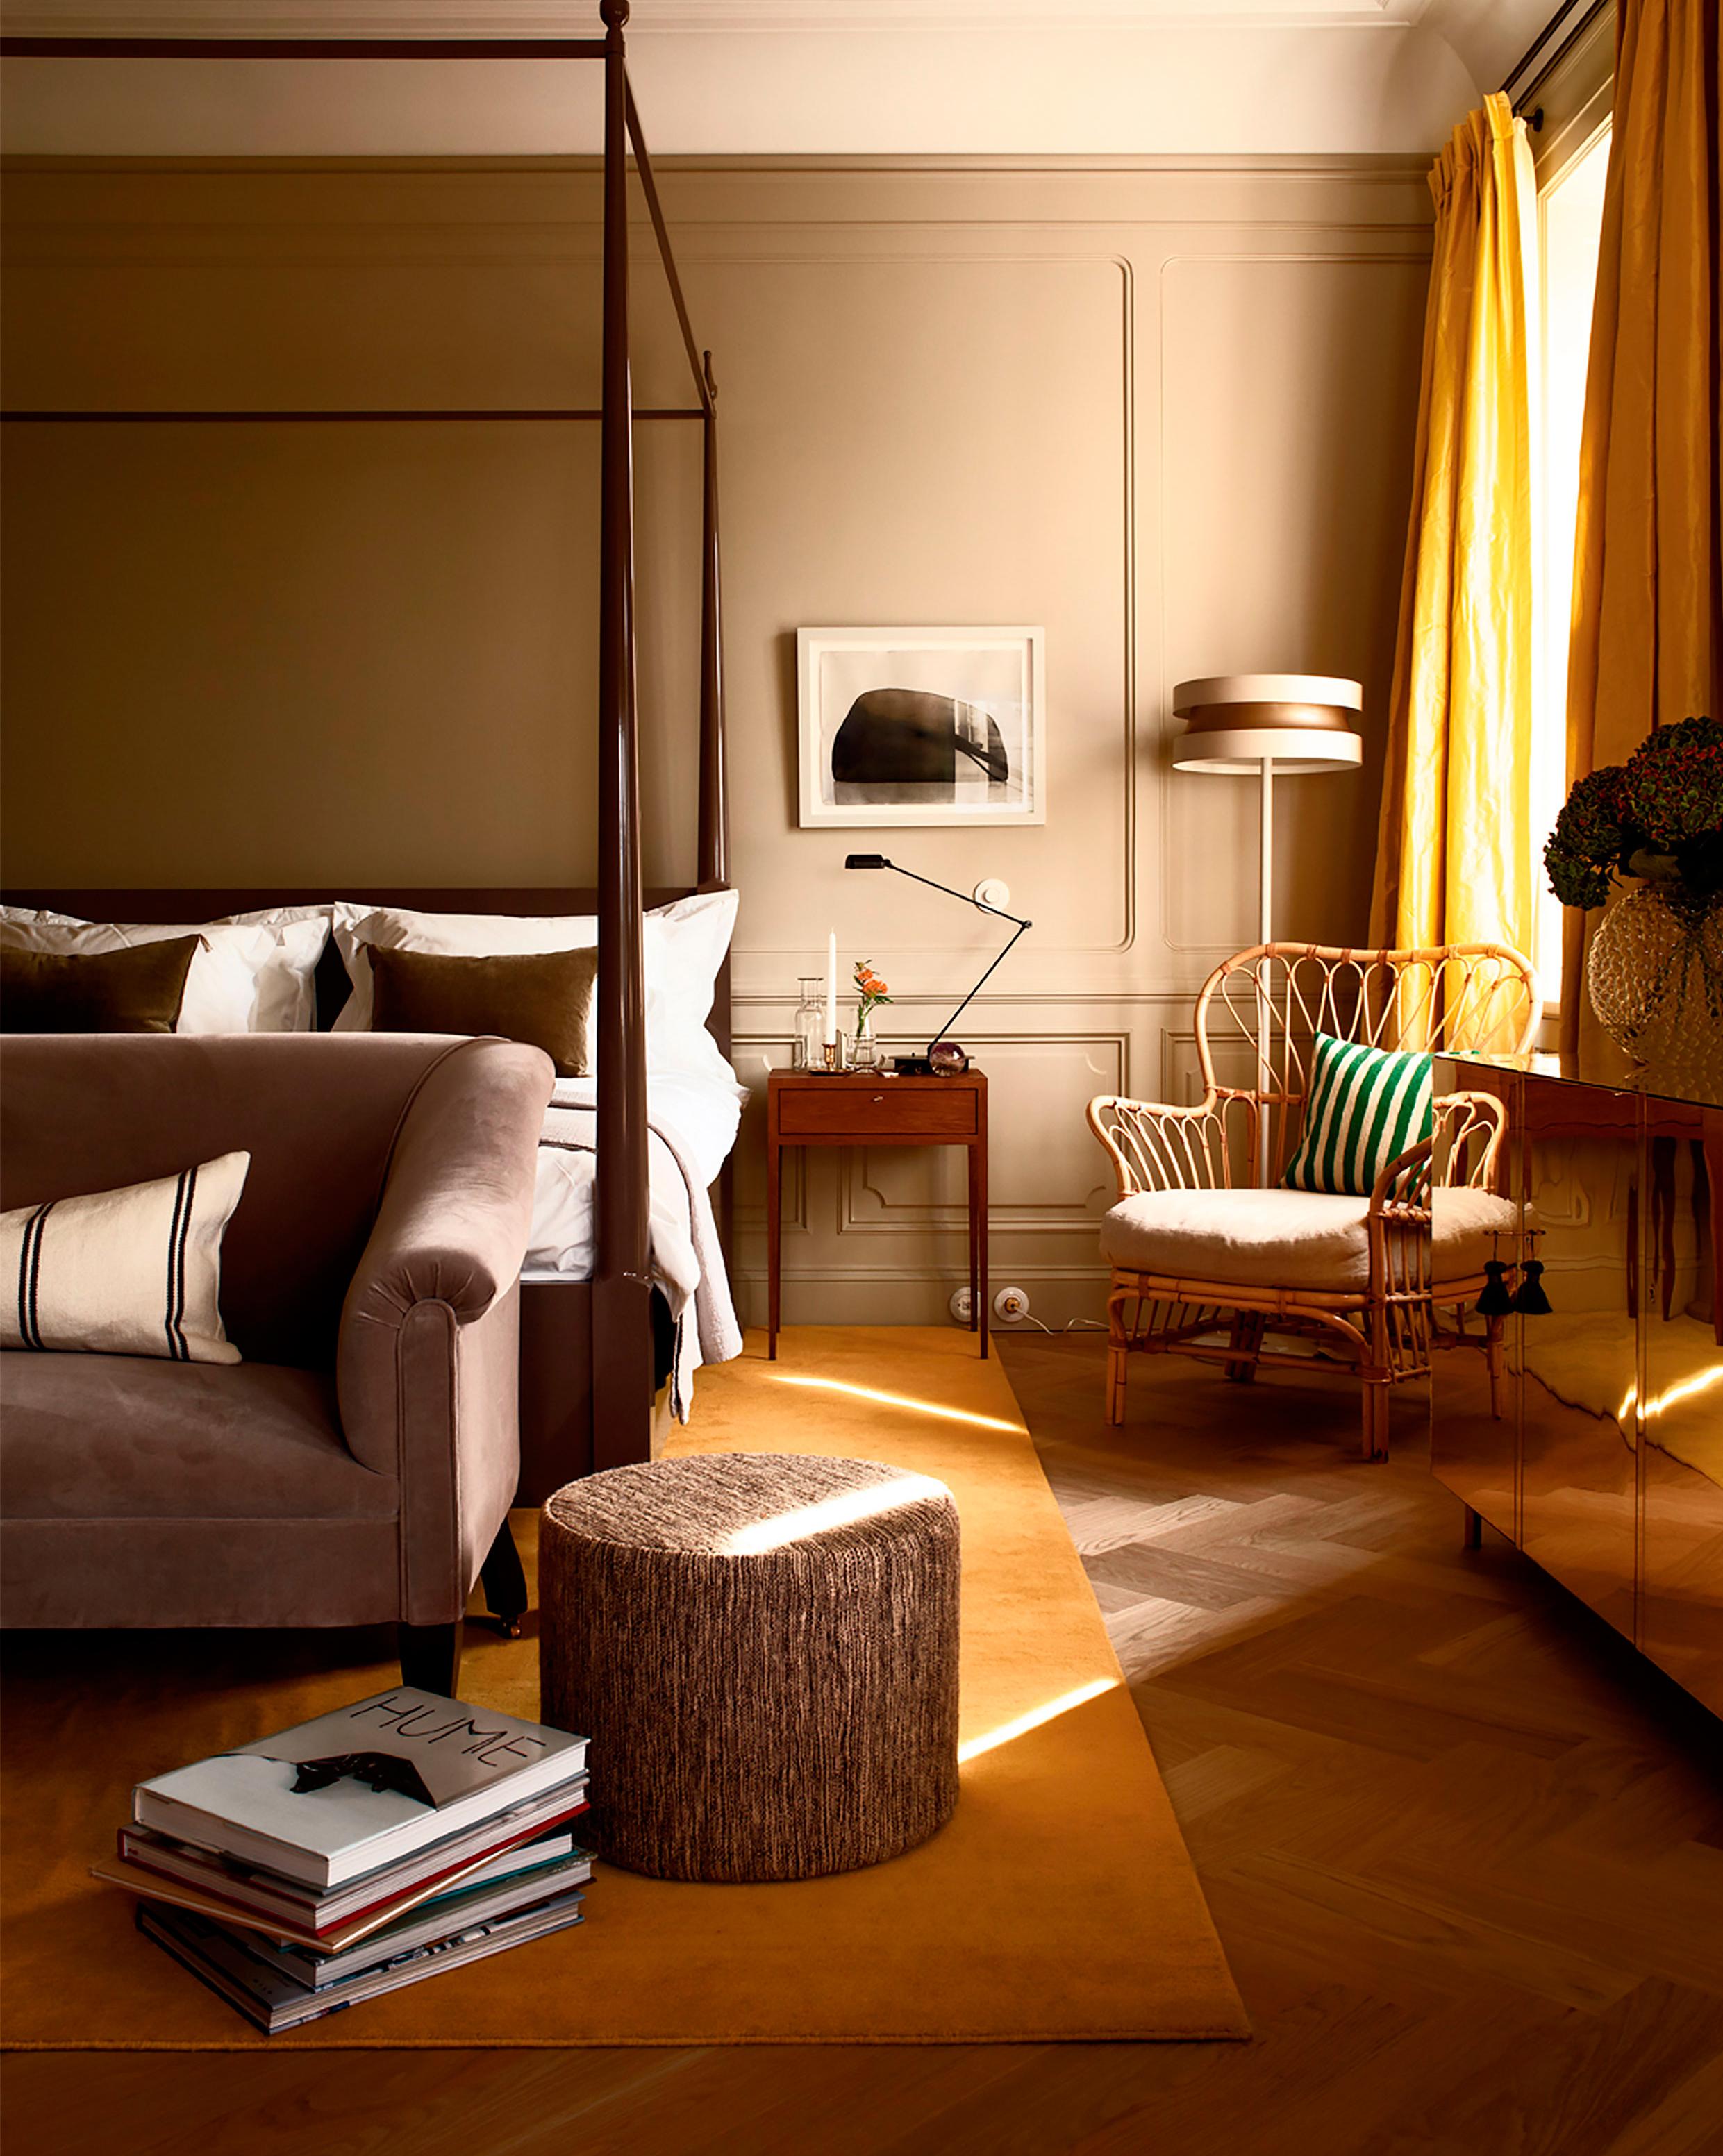 most-romantic-cities-honeymoon-stockholm-ett-hem-1015.jpg